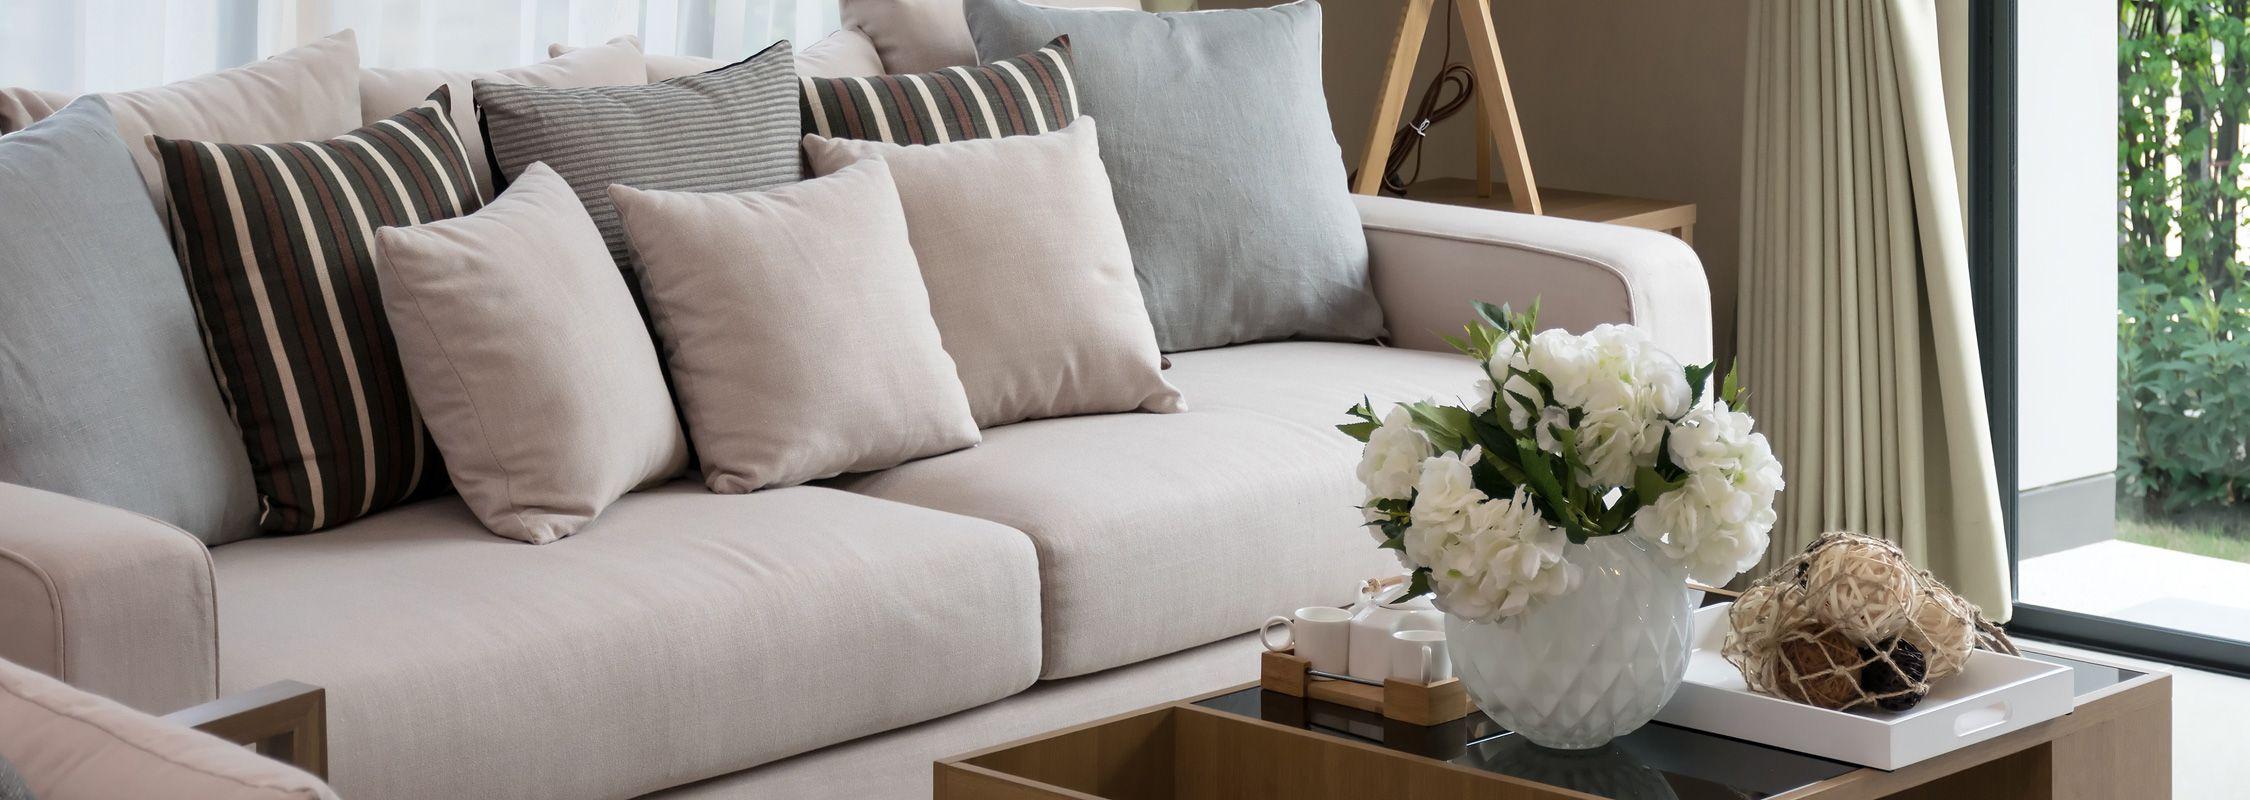 Sydney Upholstery Repair